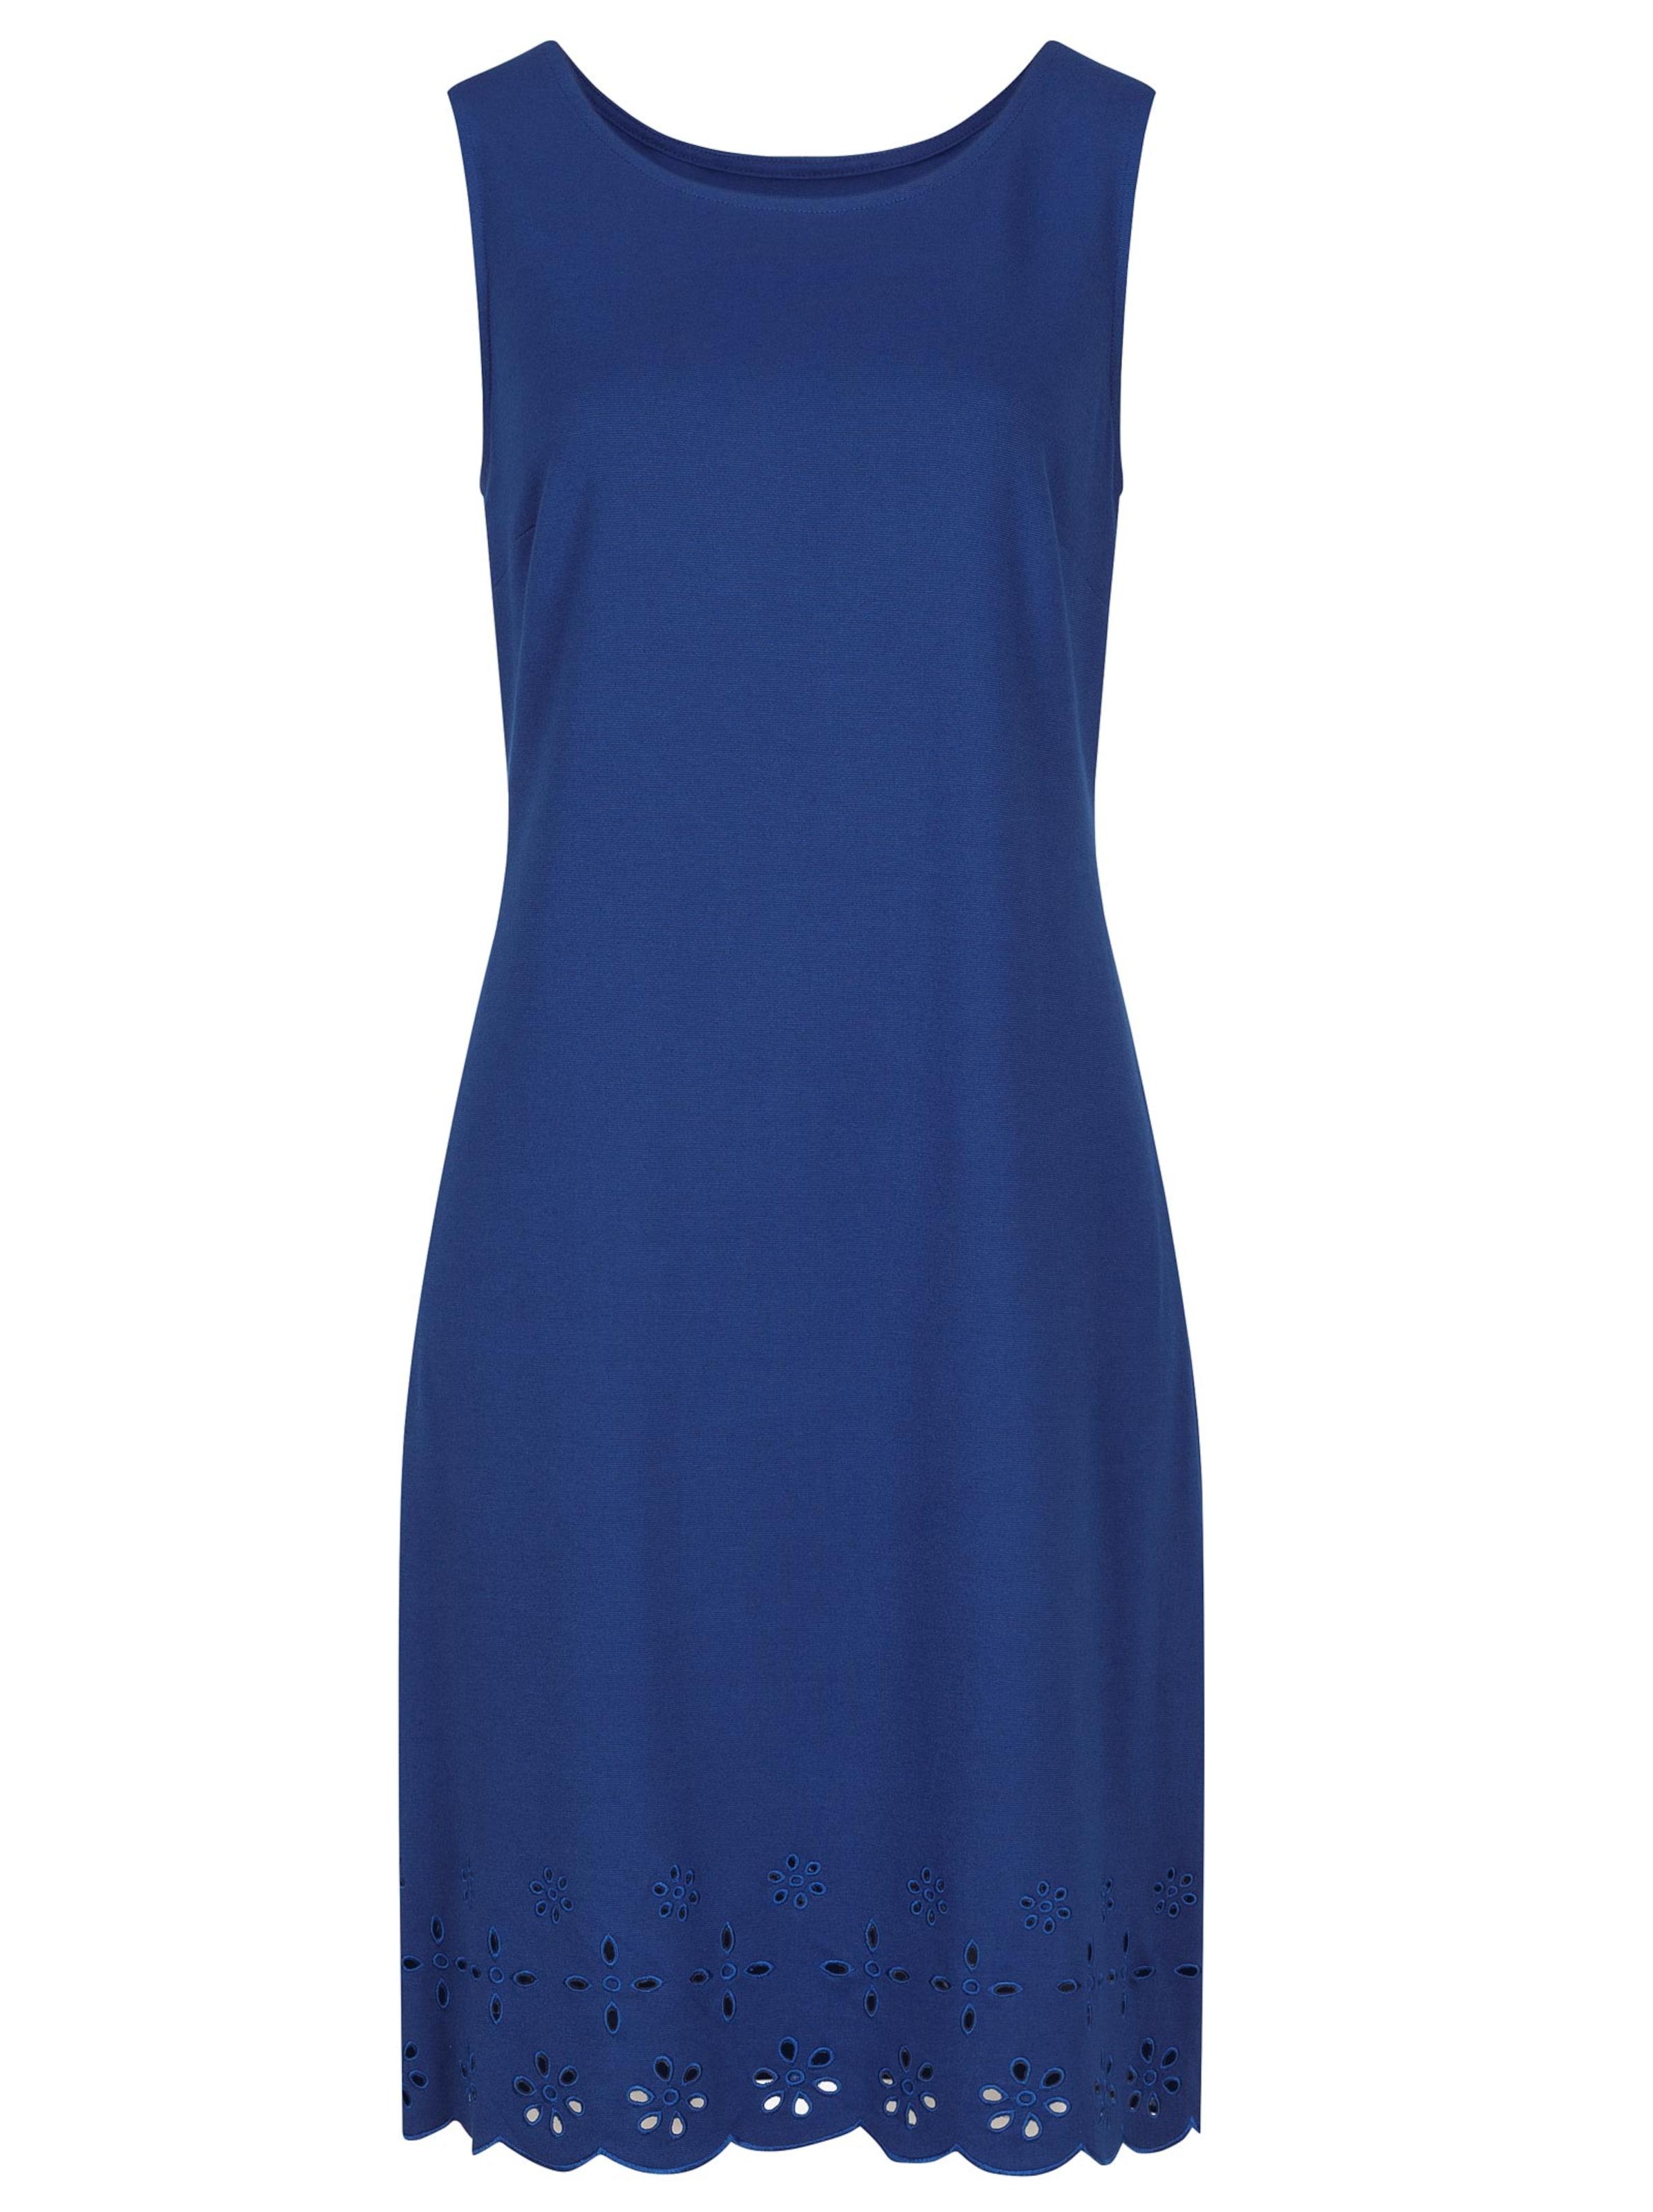 witt weiden -  Damen Jersey-Kleid royalblau